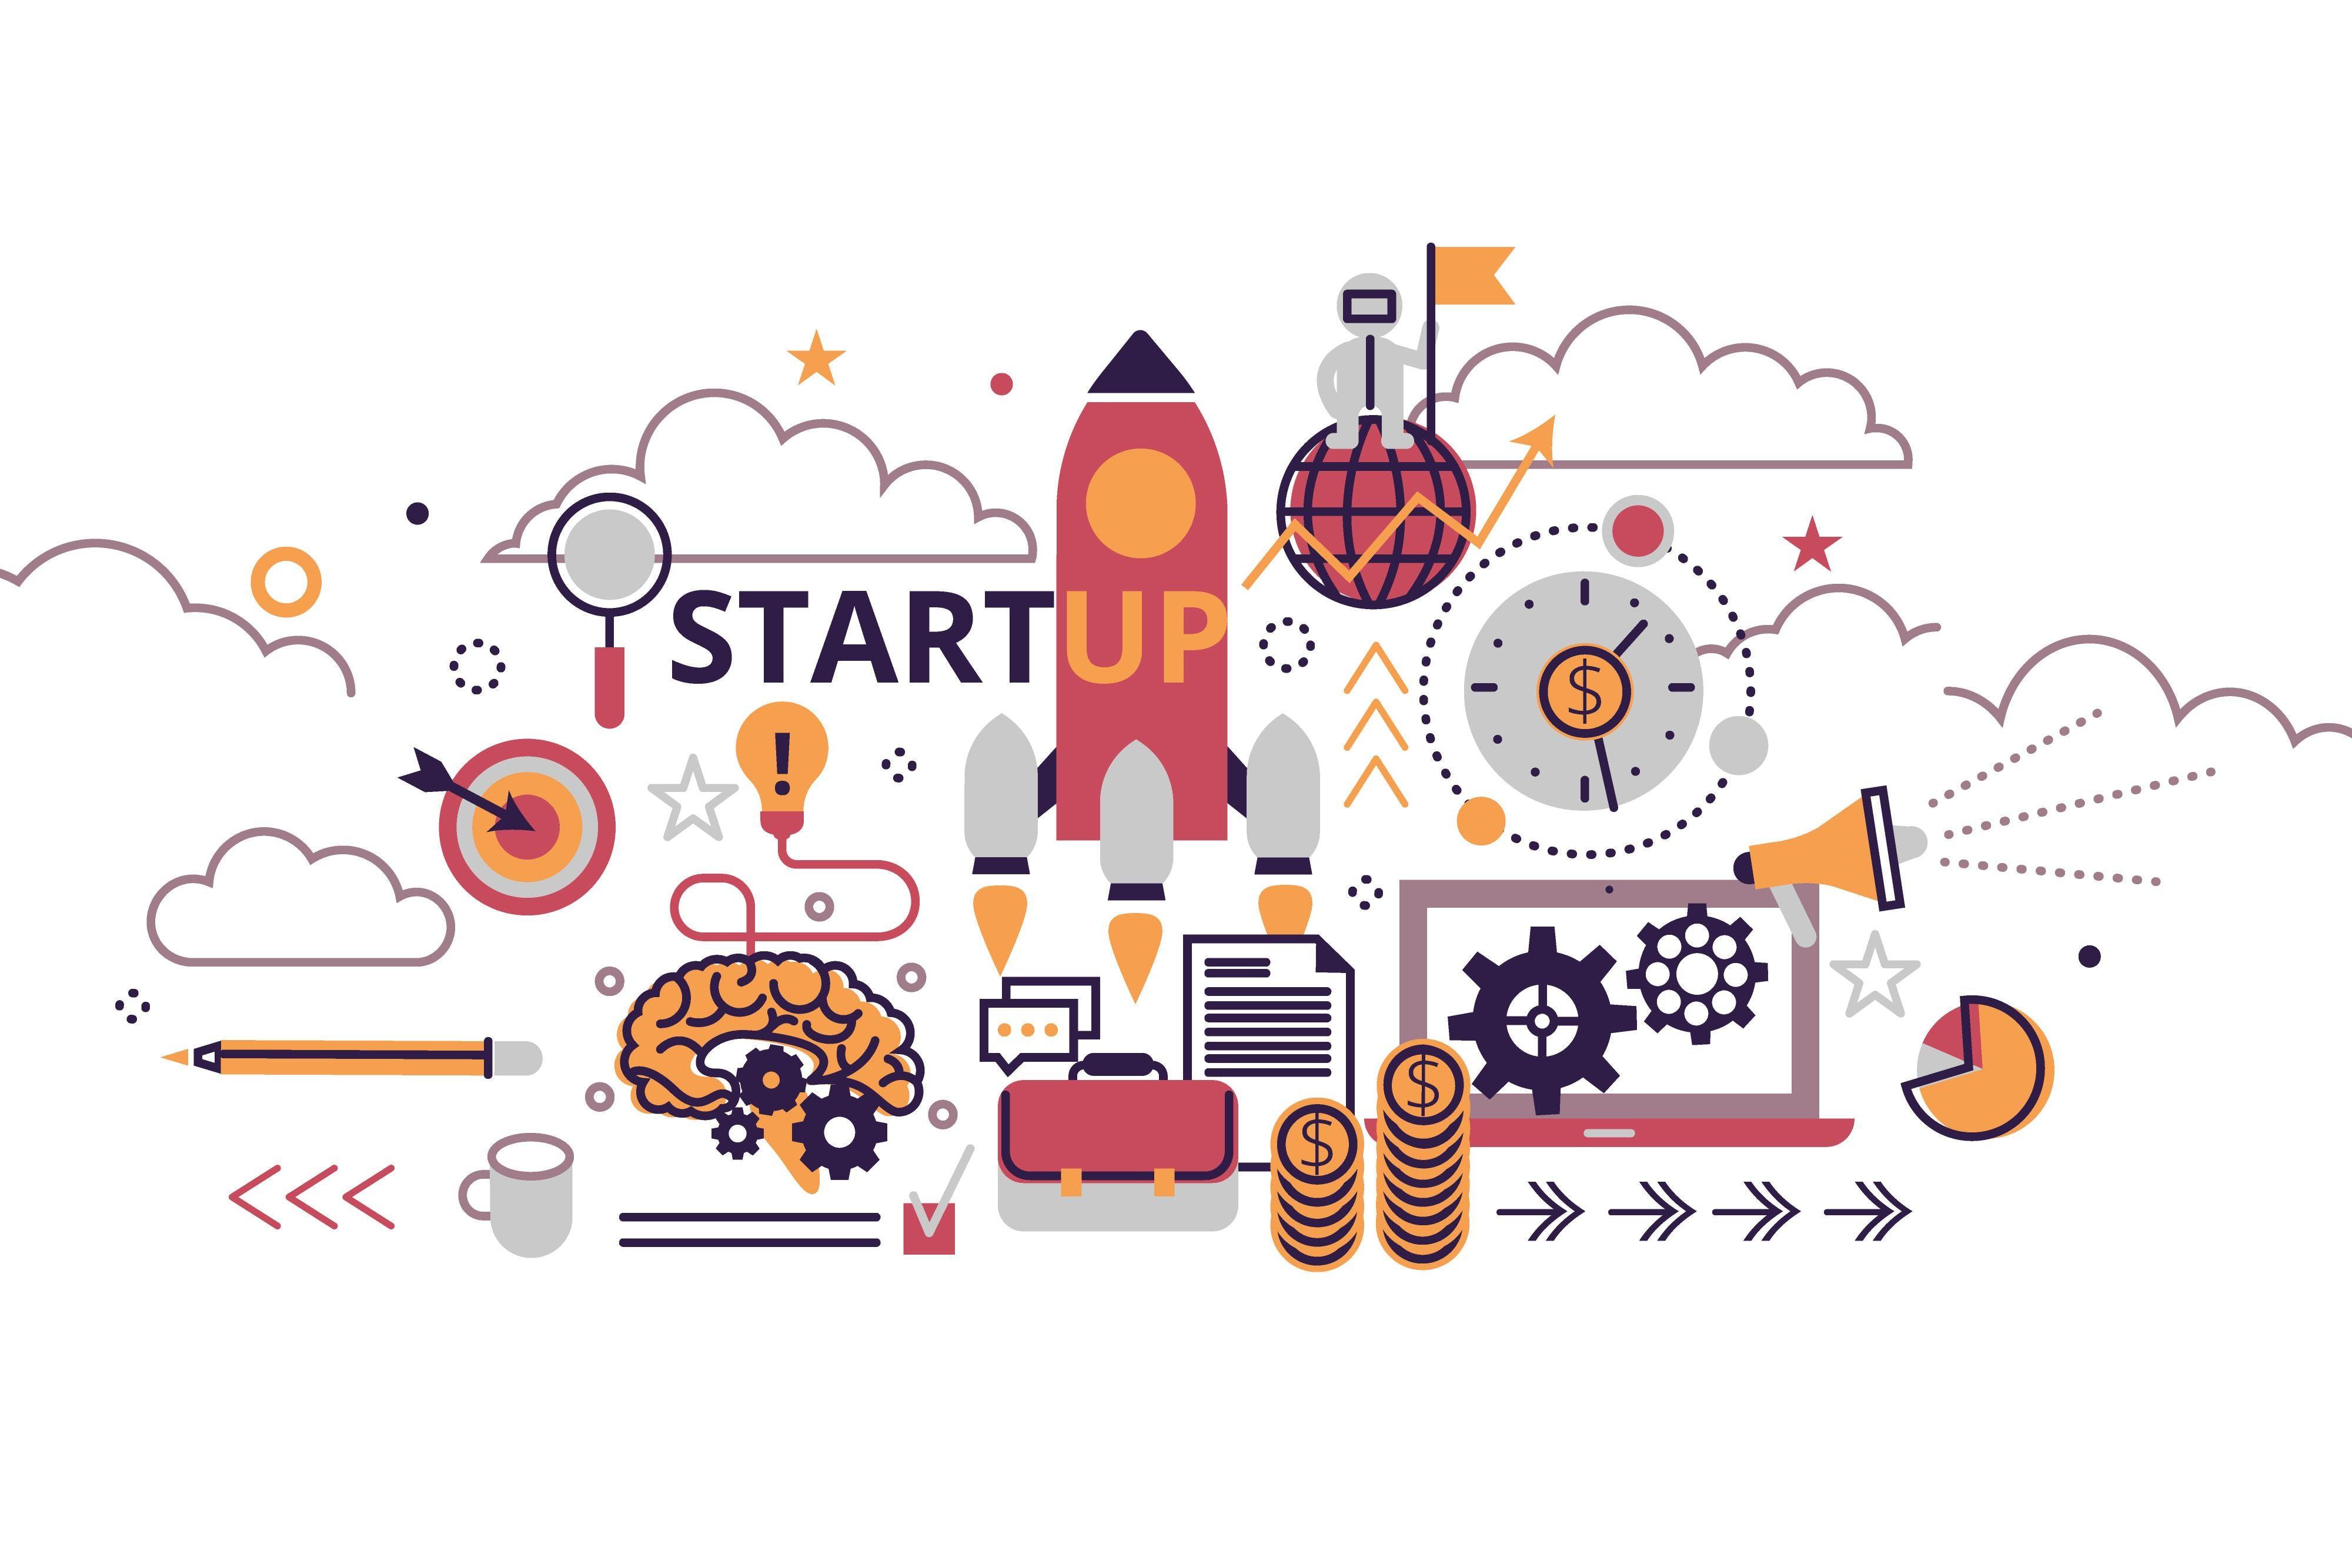 Entrepreneurship Business Development & Product Innovation Lifecycle